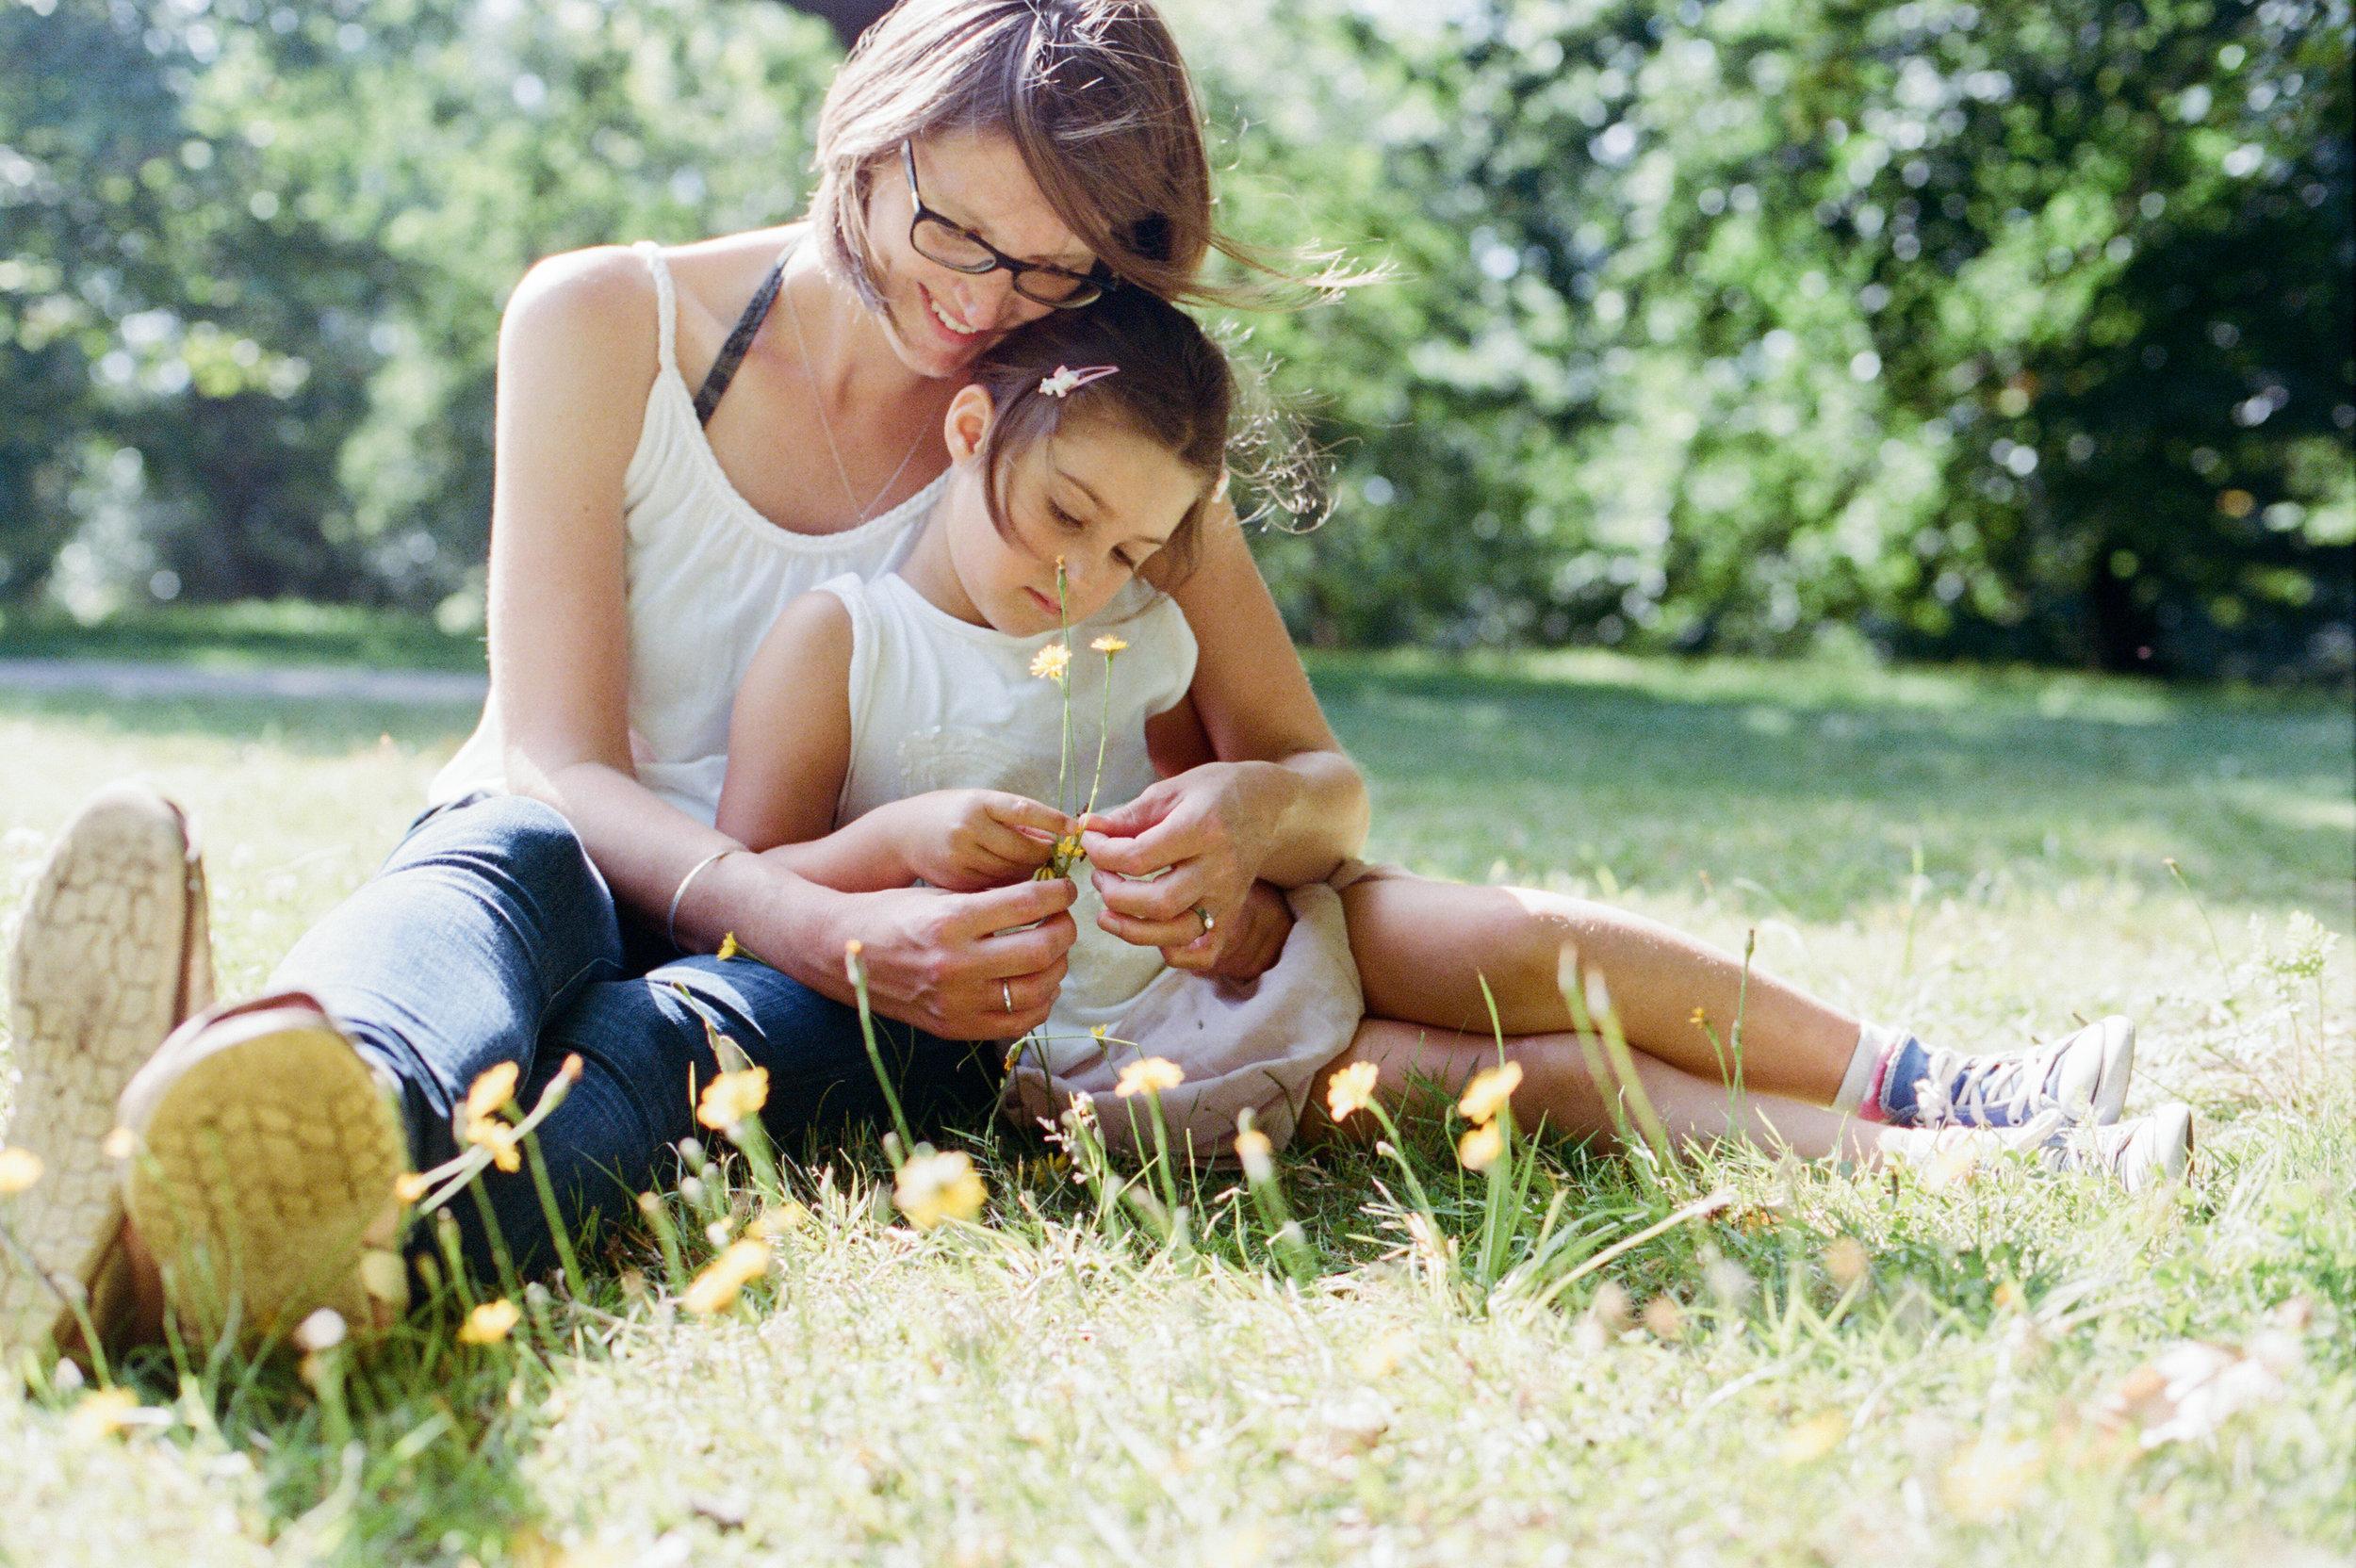 Nicola_London_Family_Photographer-94 copy.jpg